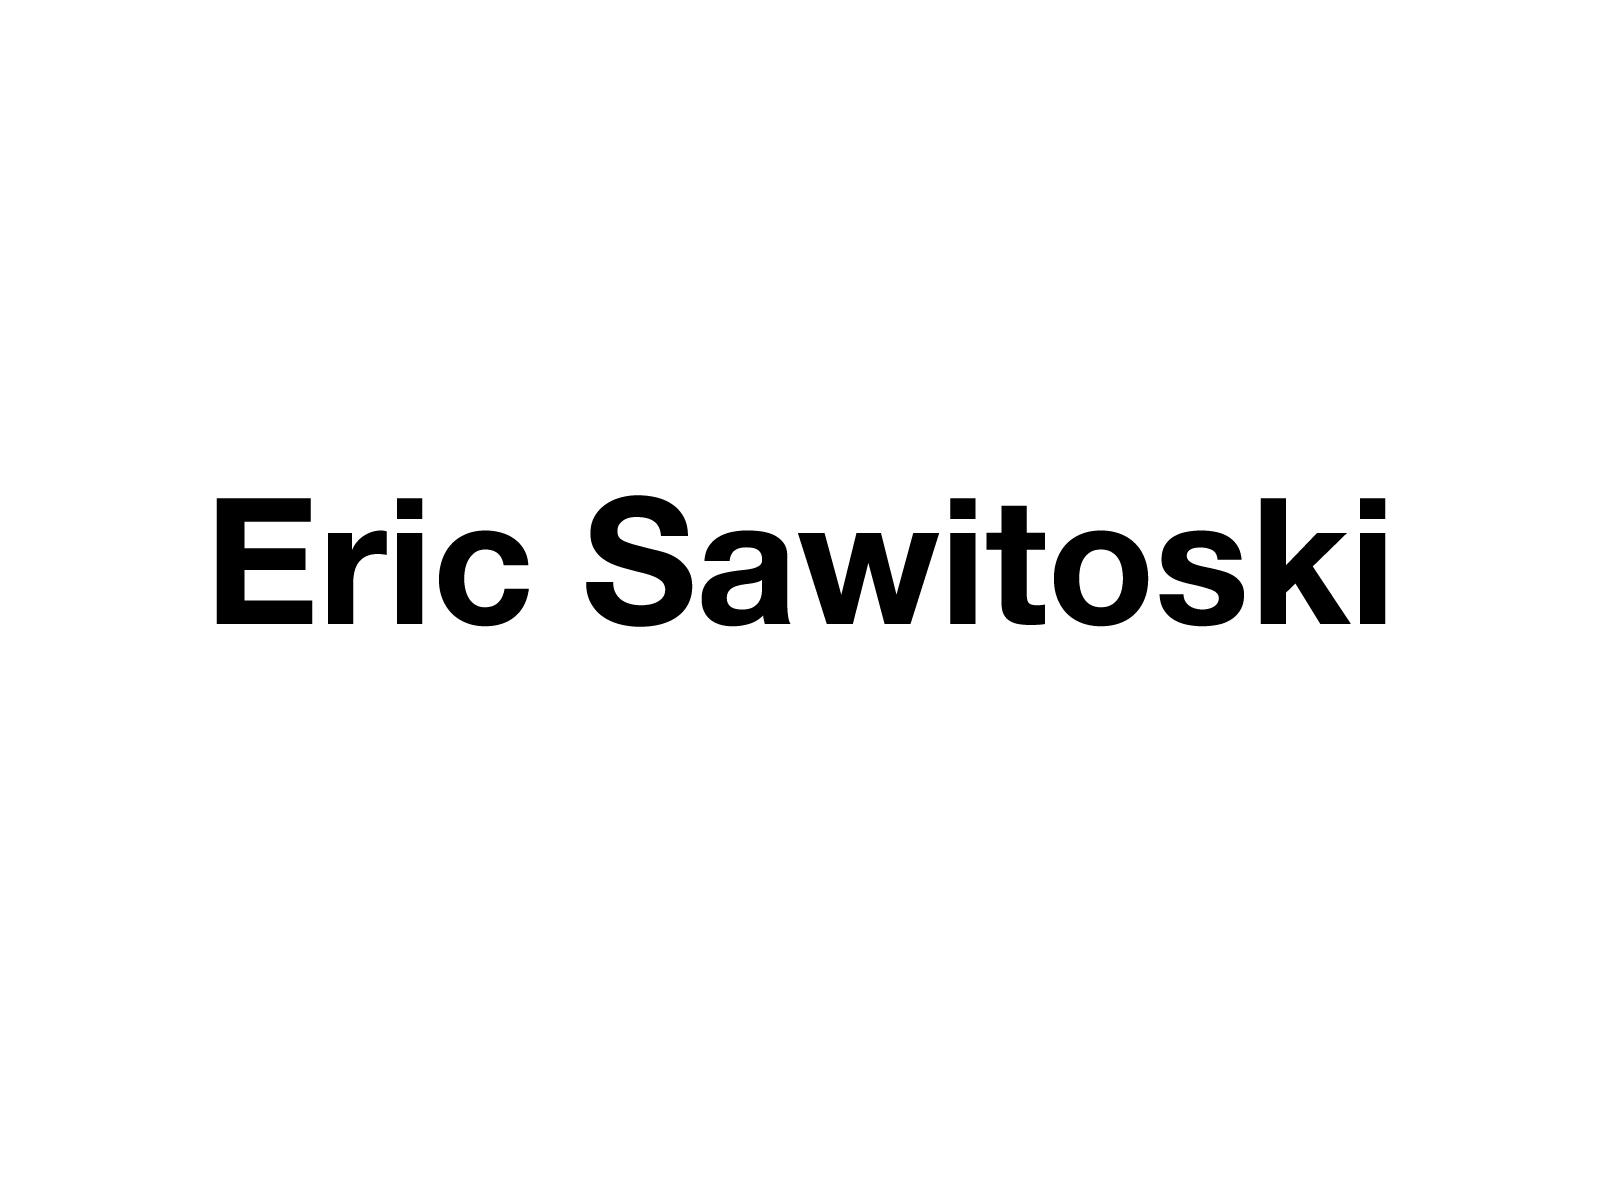 Eric Sawitoski